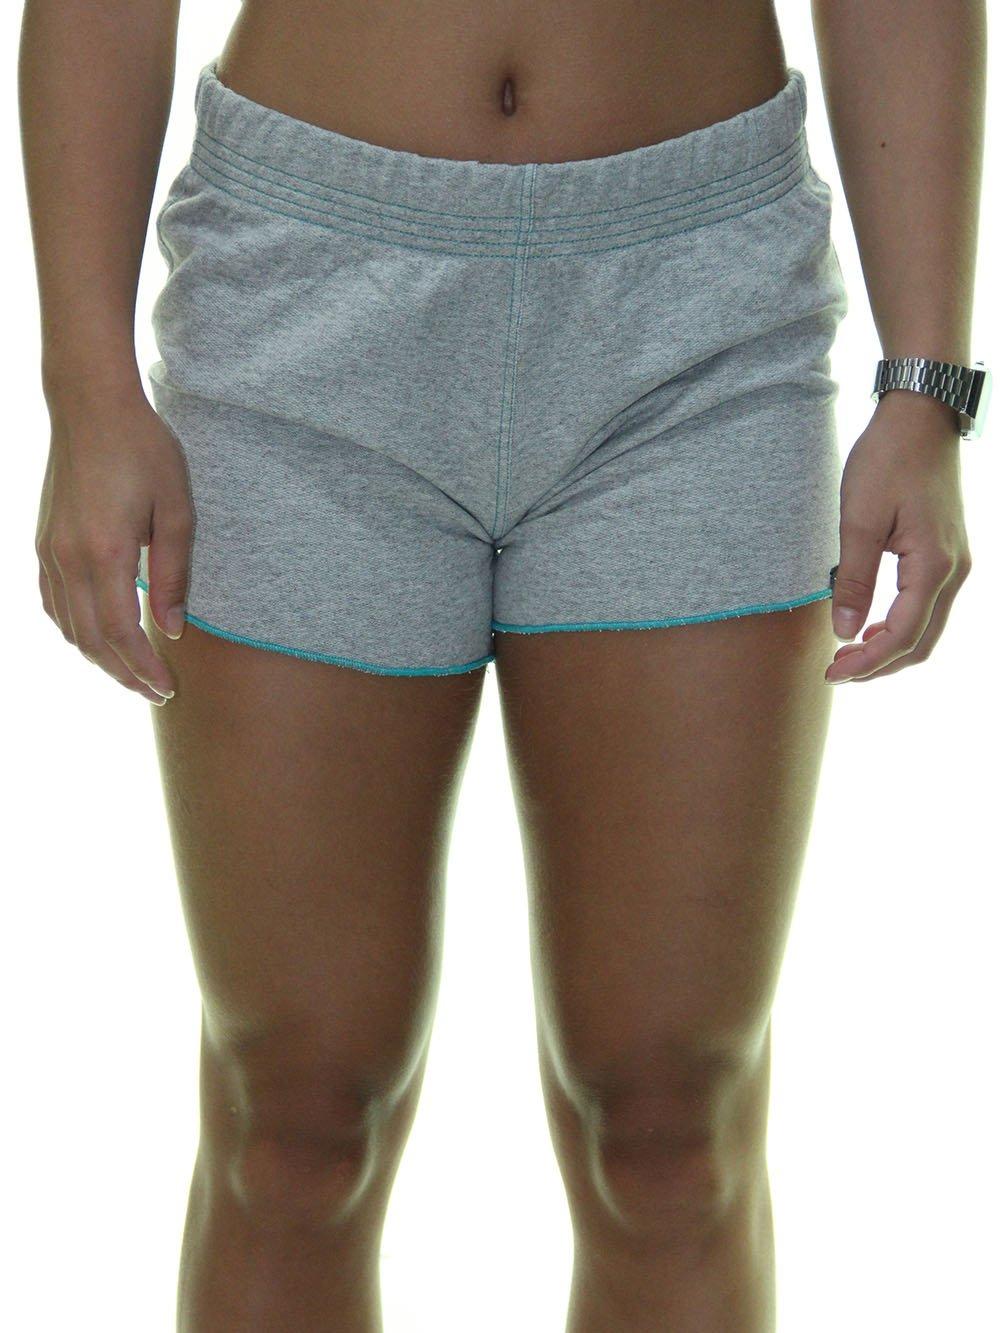 Shorts Feminino Hurley Malha All De Moletom Cinza Mesclado